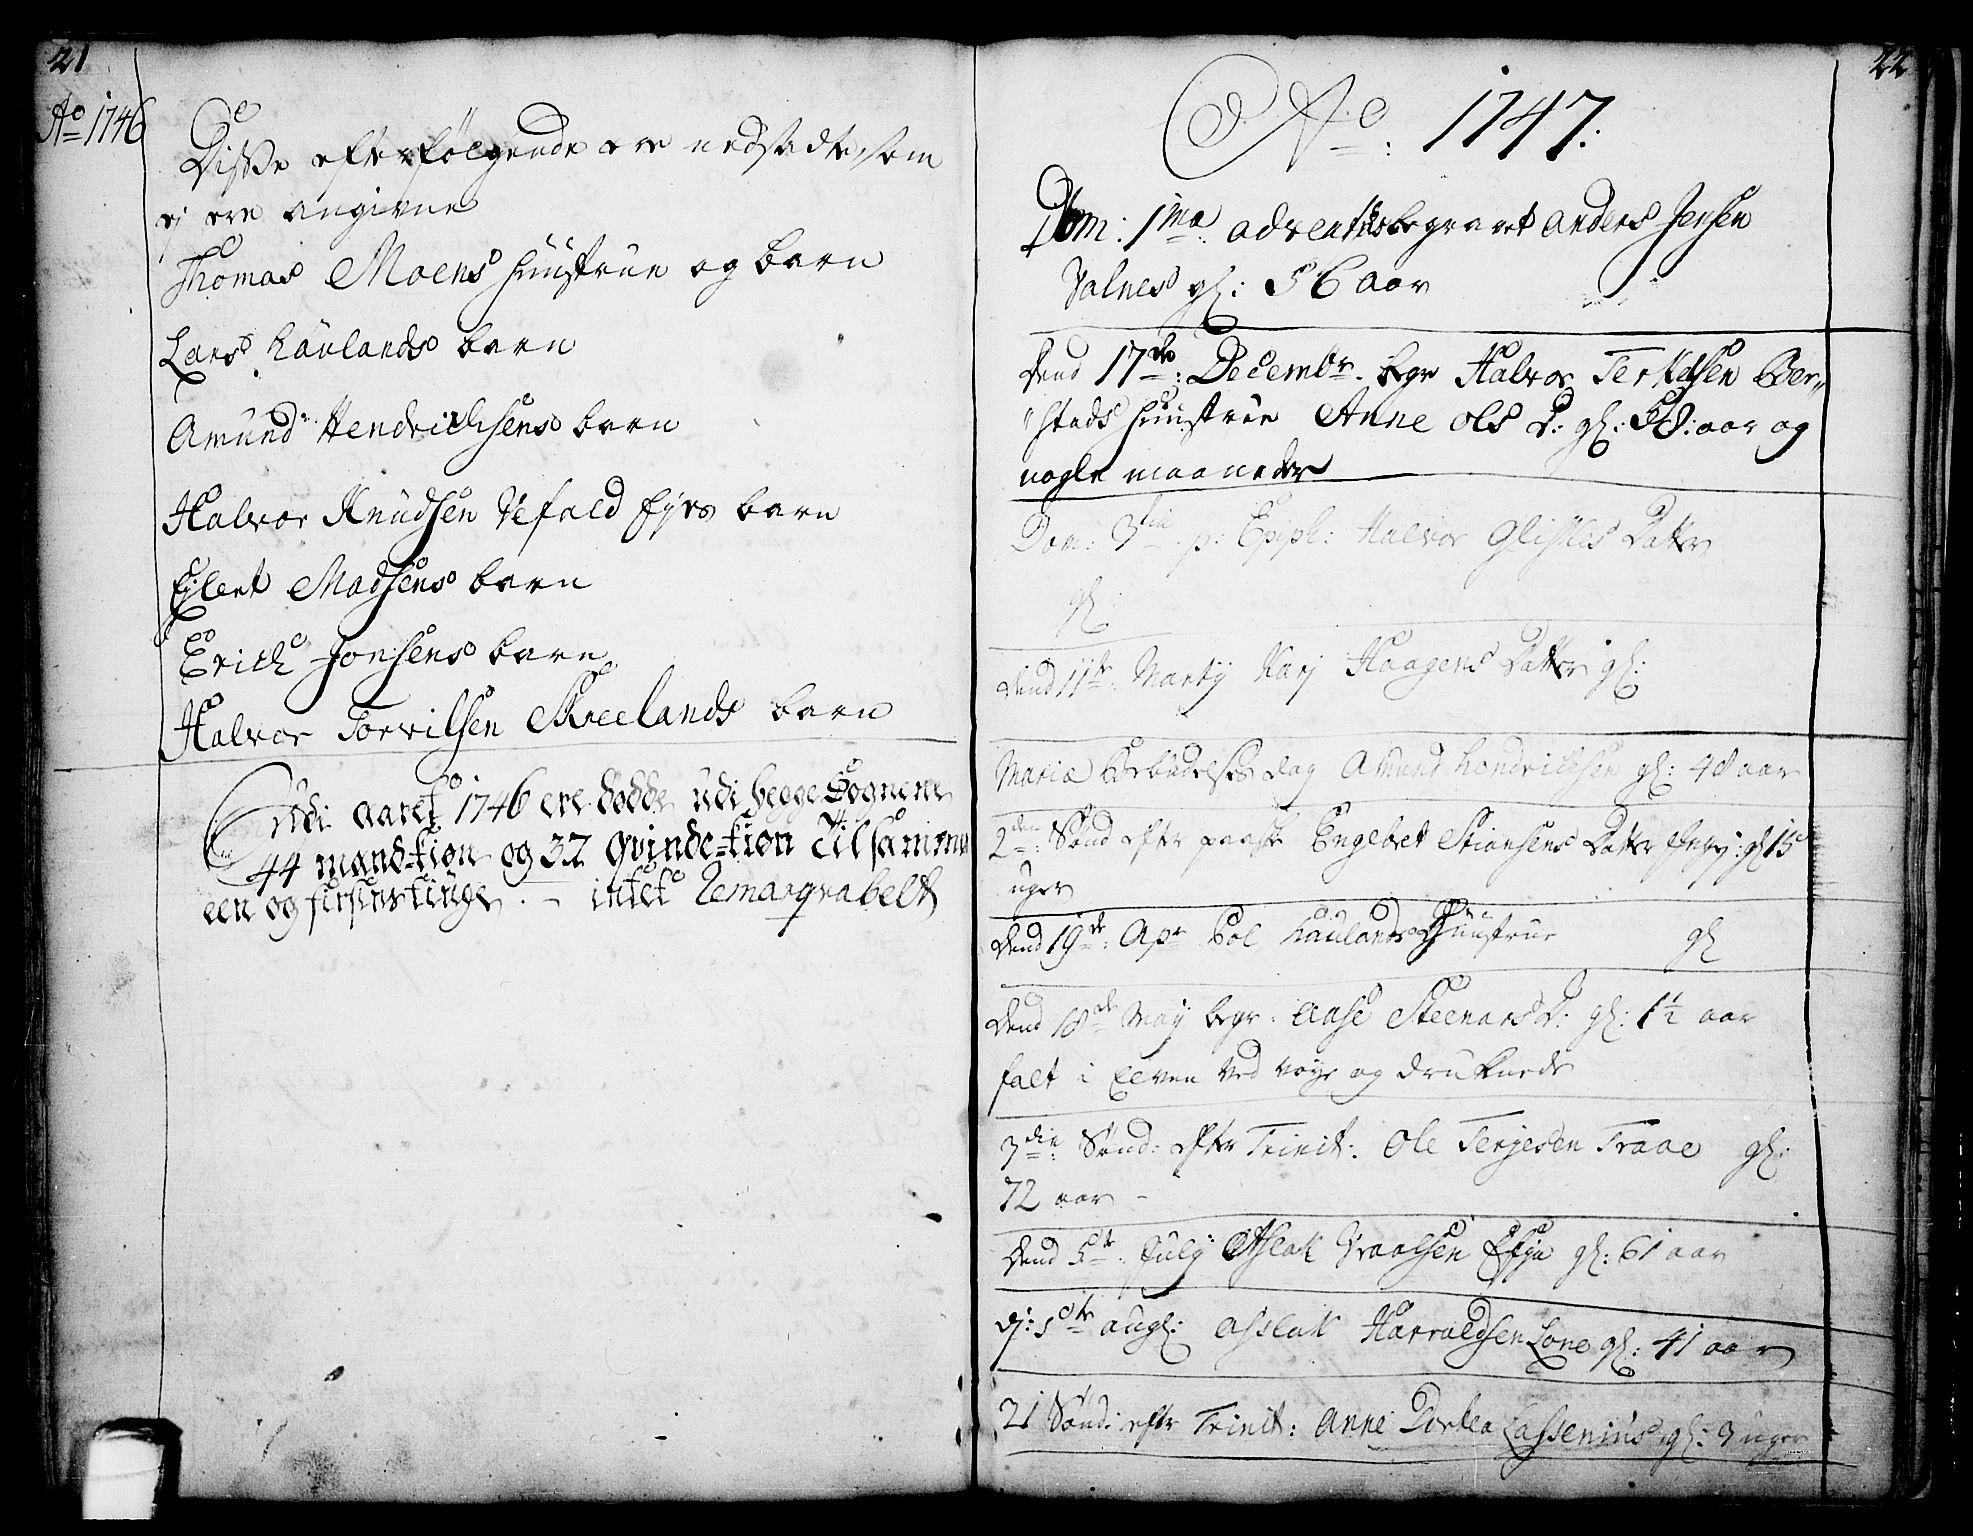 SAKO, Drangedal kirkebøker, F/Fa/L0002: Ministerialbok nr. 2, 1733-1753, s. 21-22